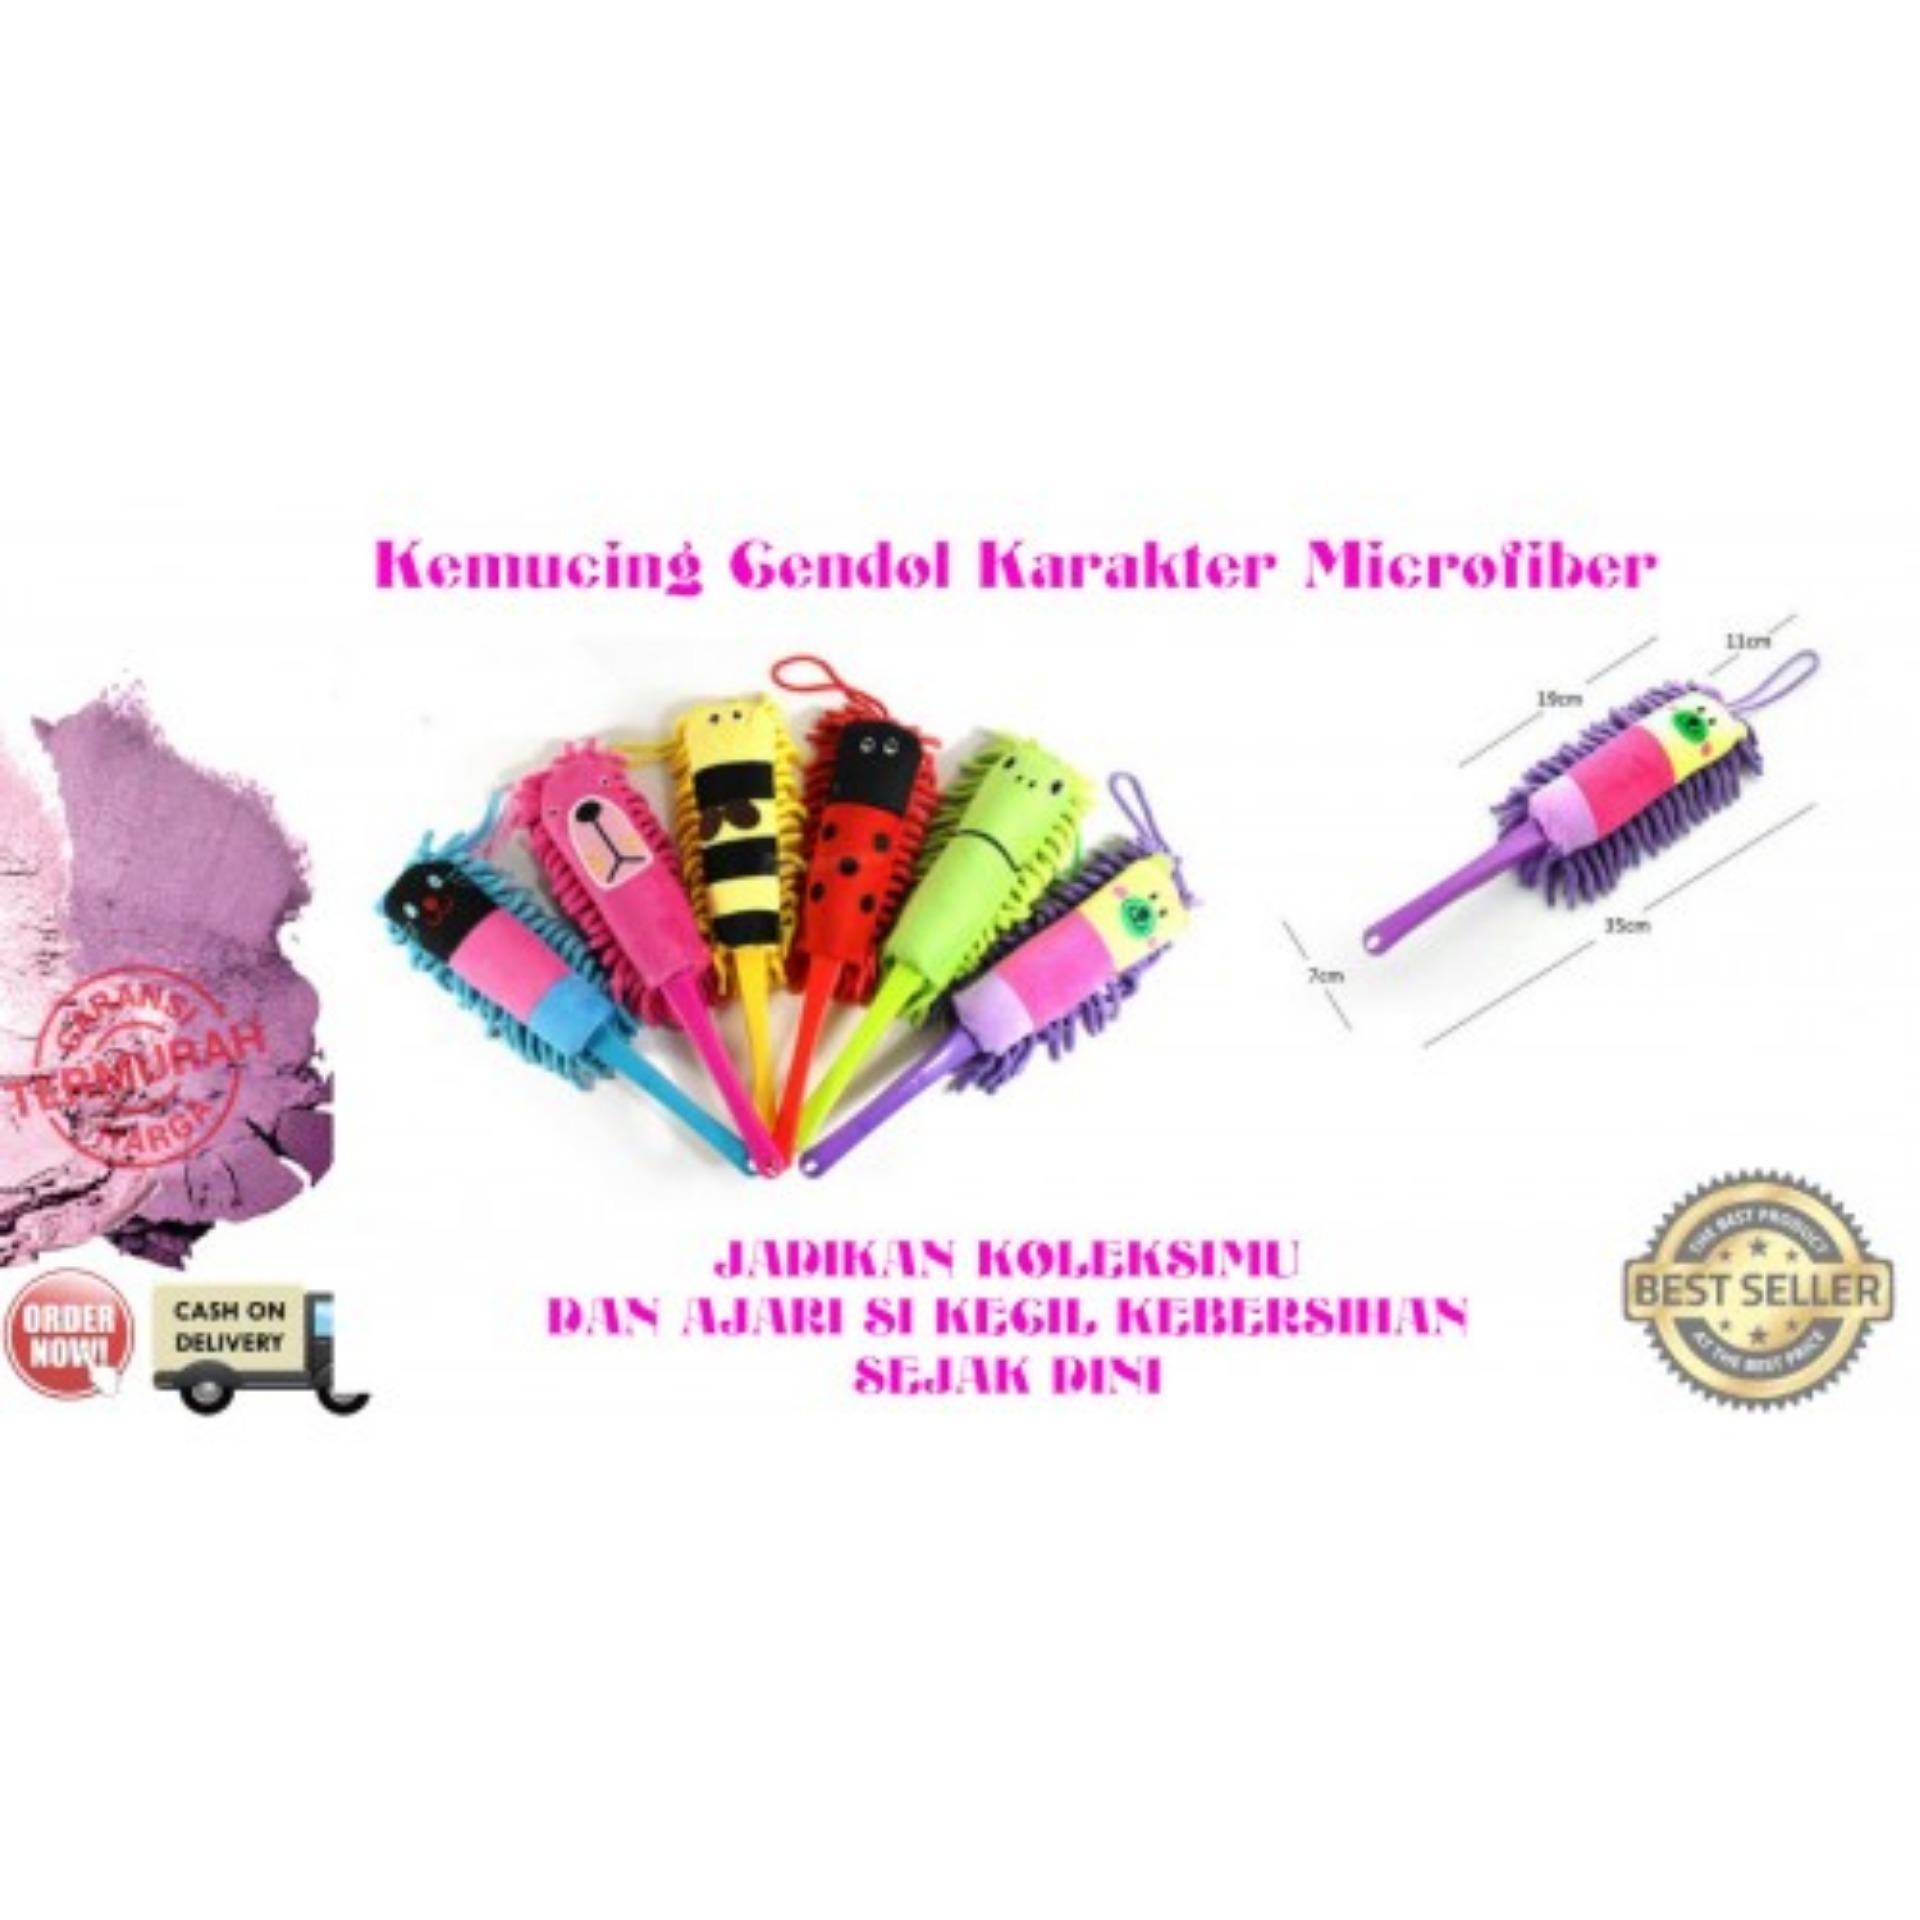 ... Pembersih debu - Dusters - Random Colour - Babamu. IDR 36,900 IDR36900. View Detail. Hybridtech - Kemoceng Cendol Karakter Microfiber